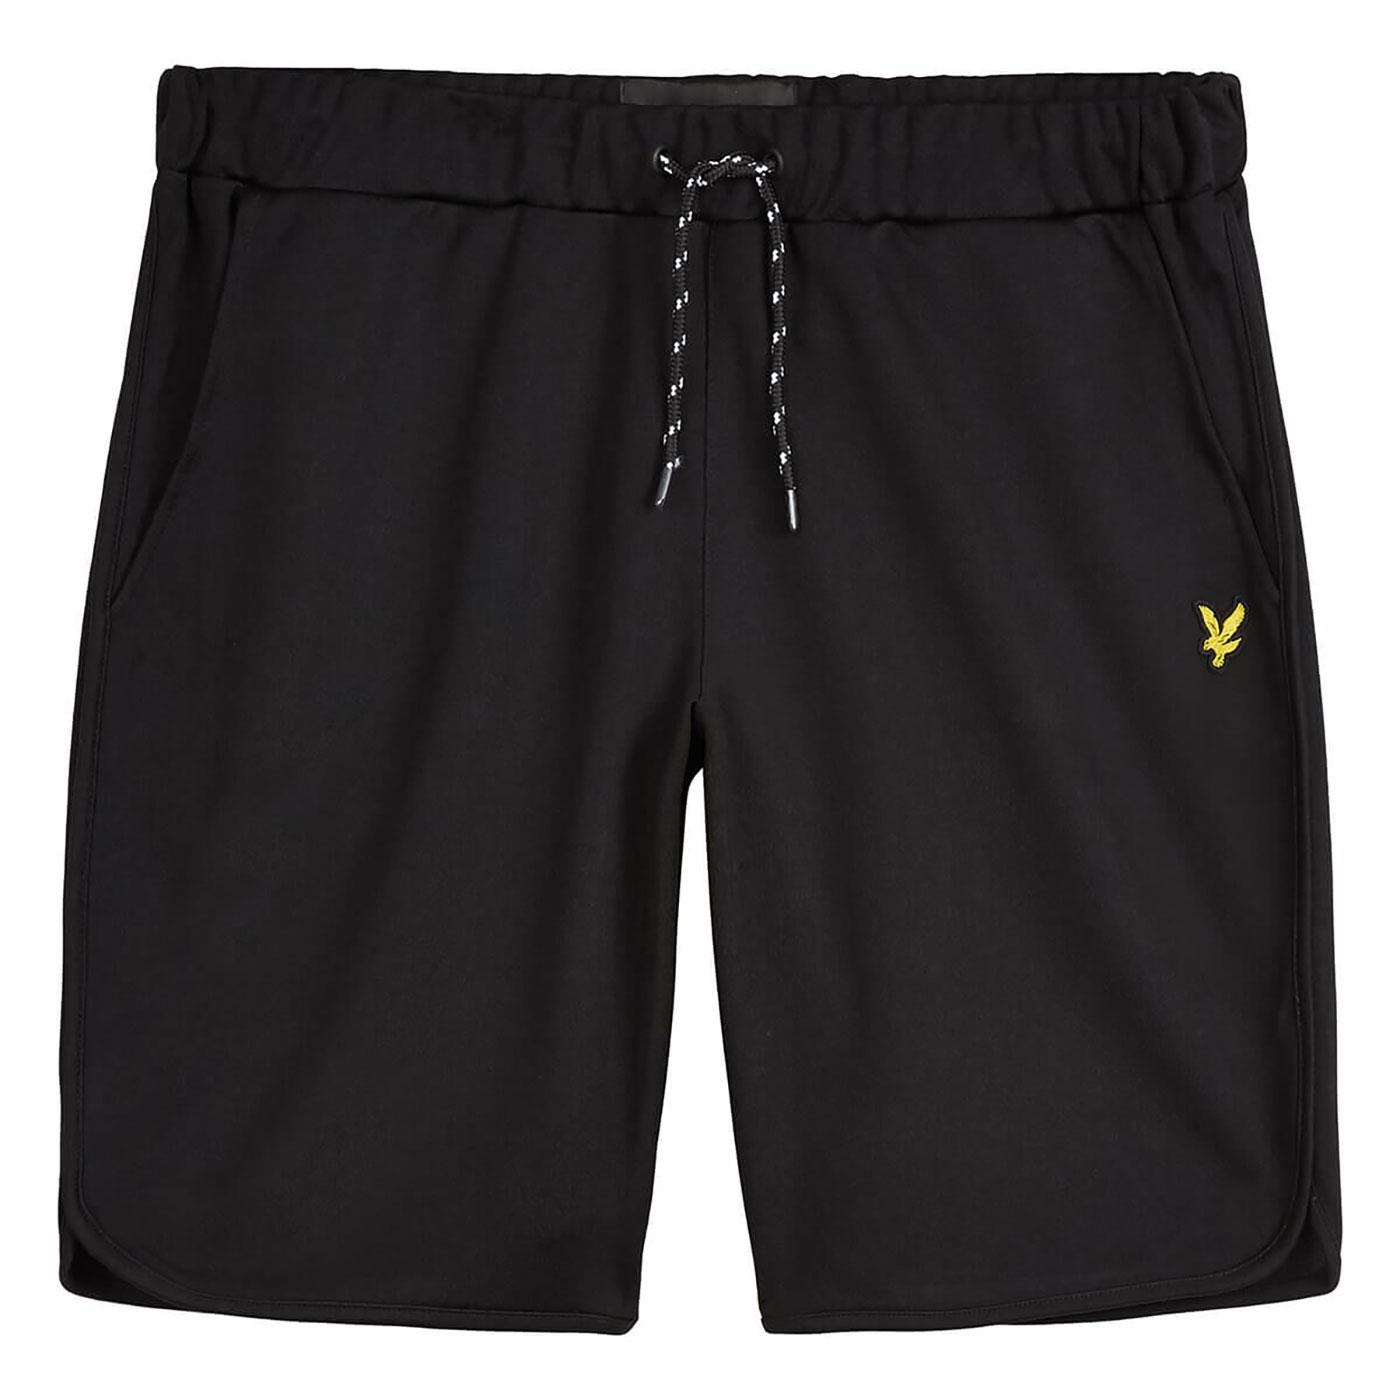 LYLE & SCOTT Men's Retro Football Shorts - Black